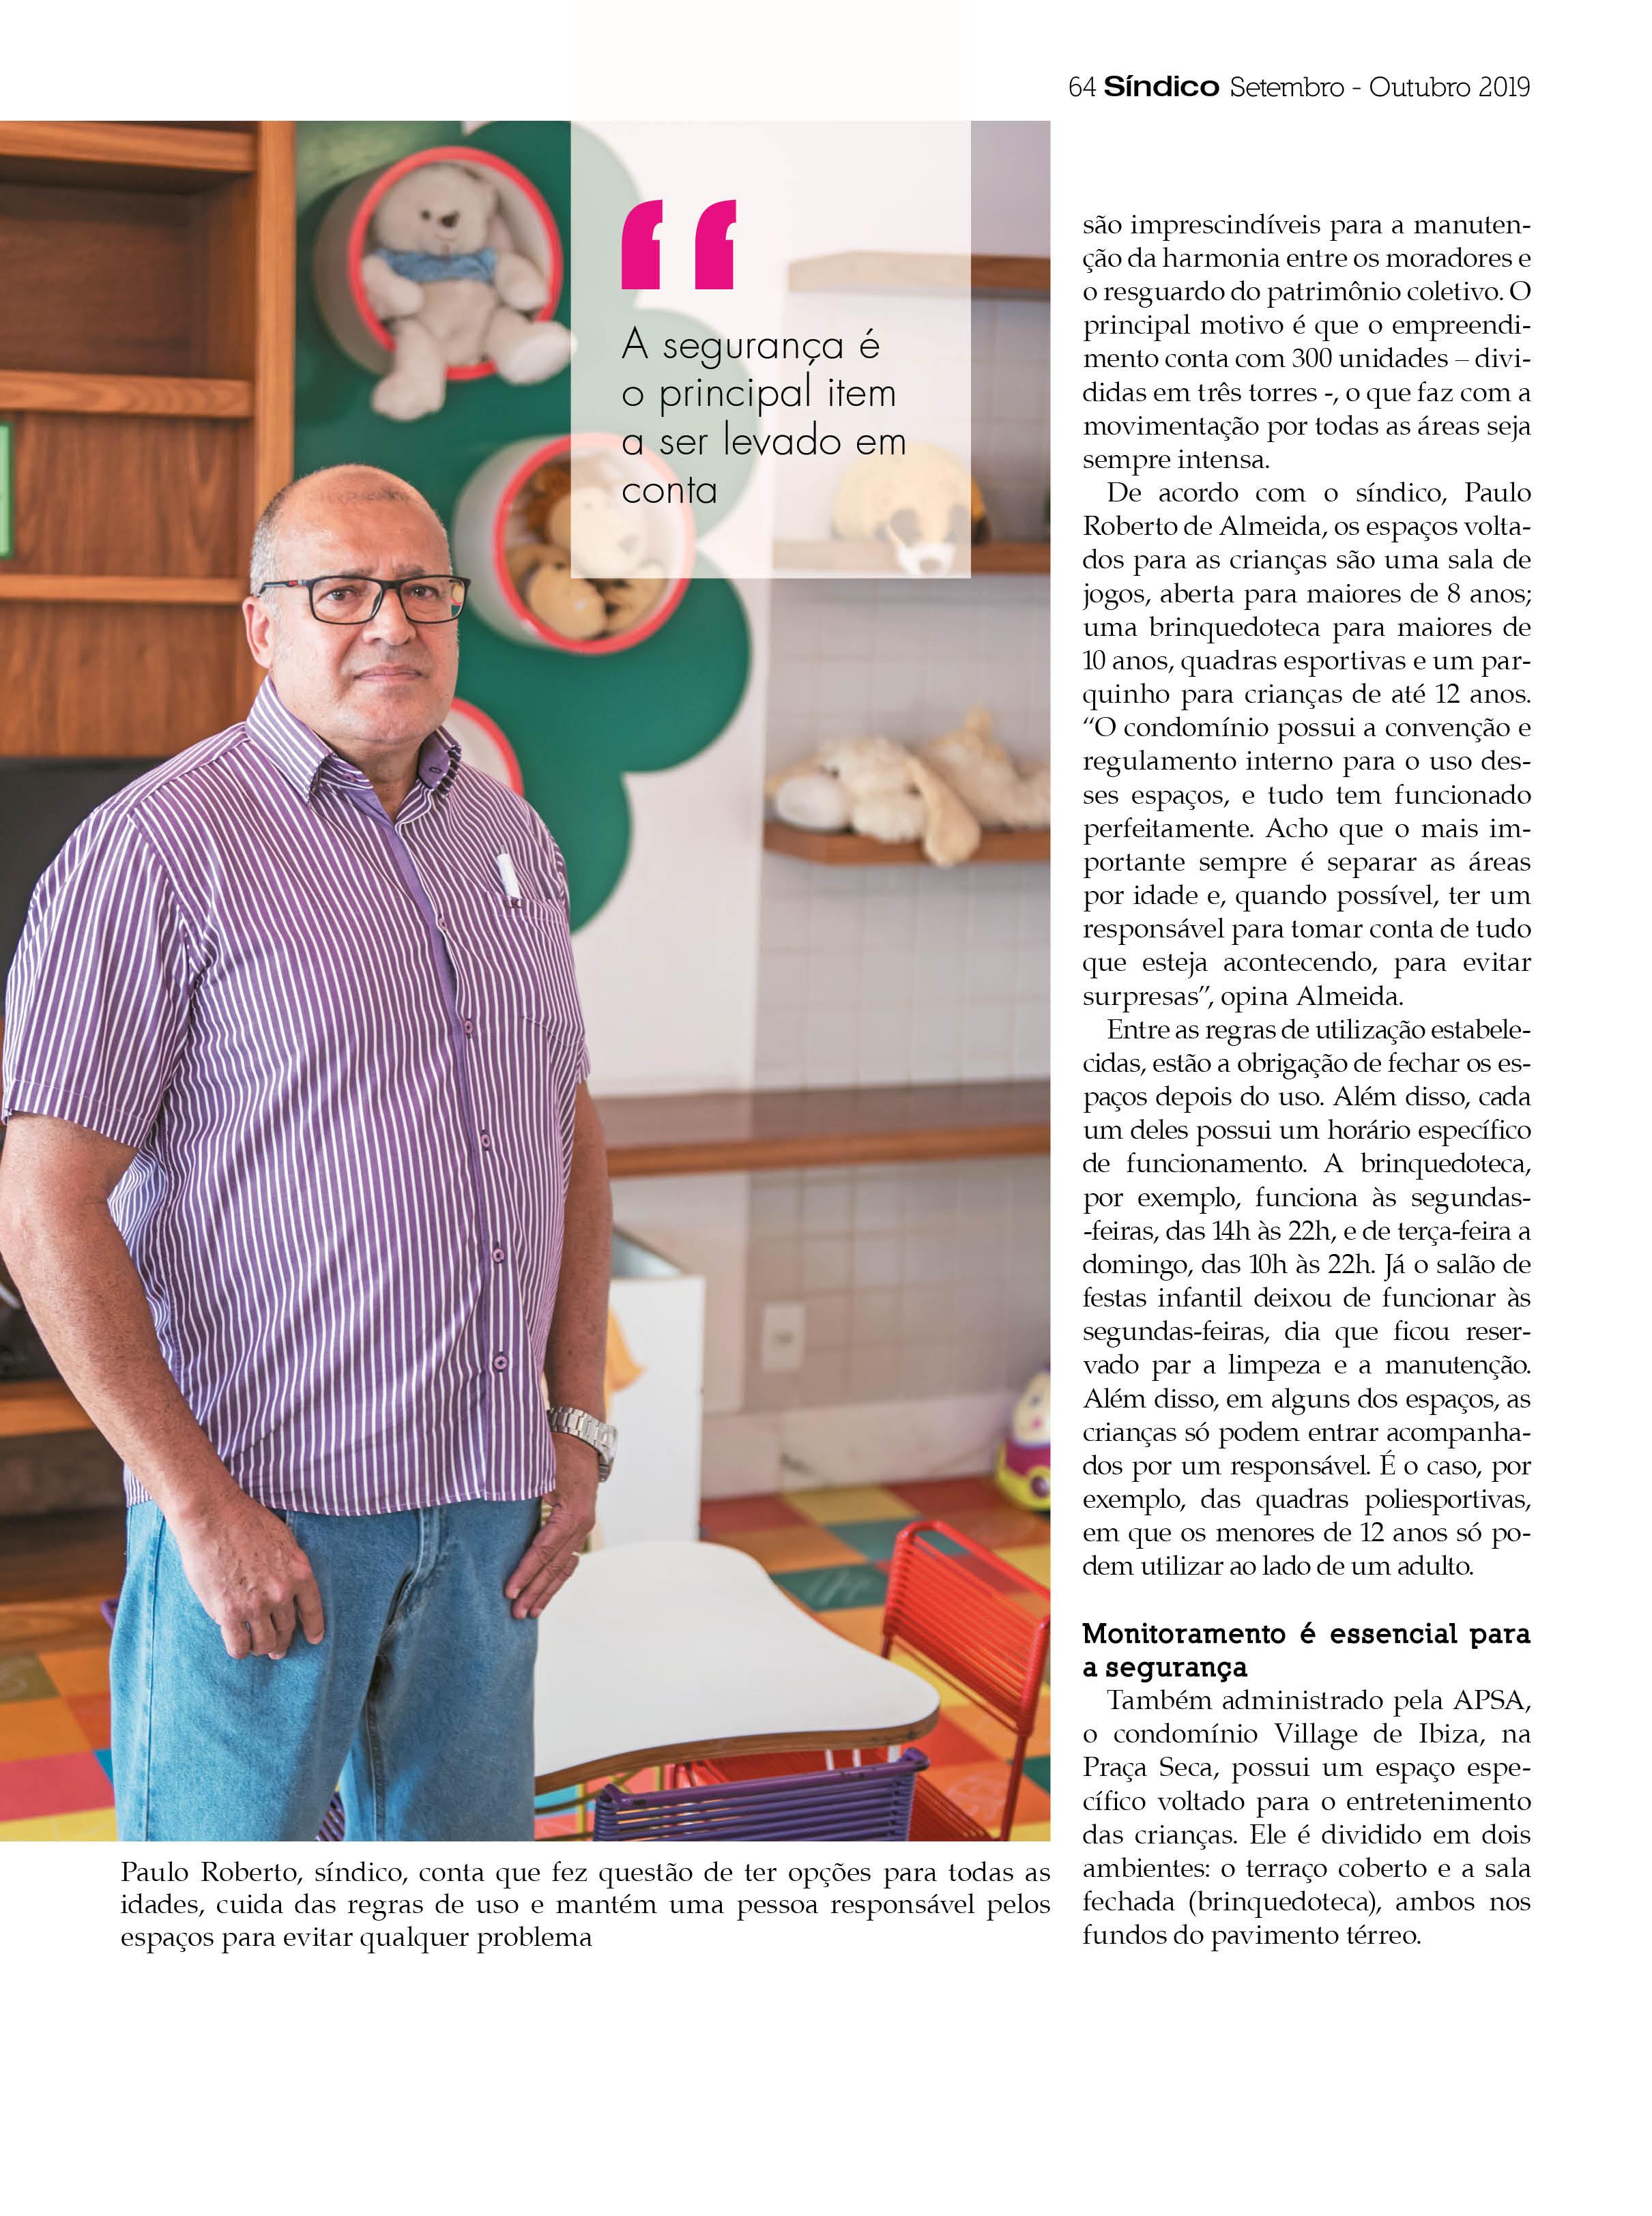 Revista Síndico_ed 246_62